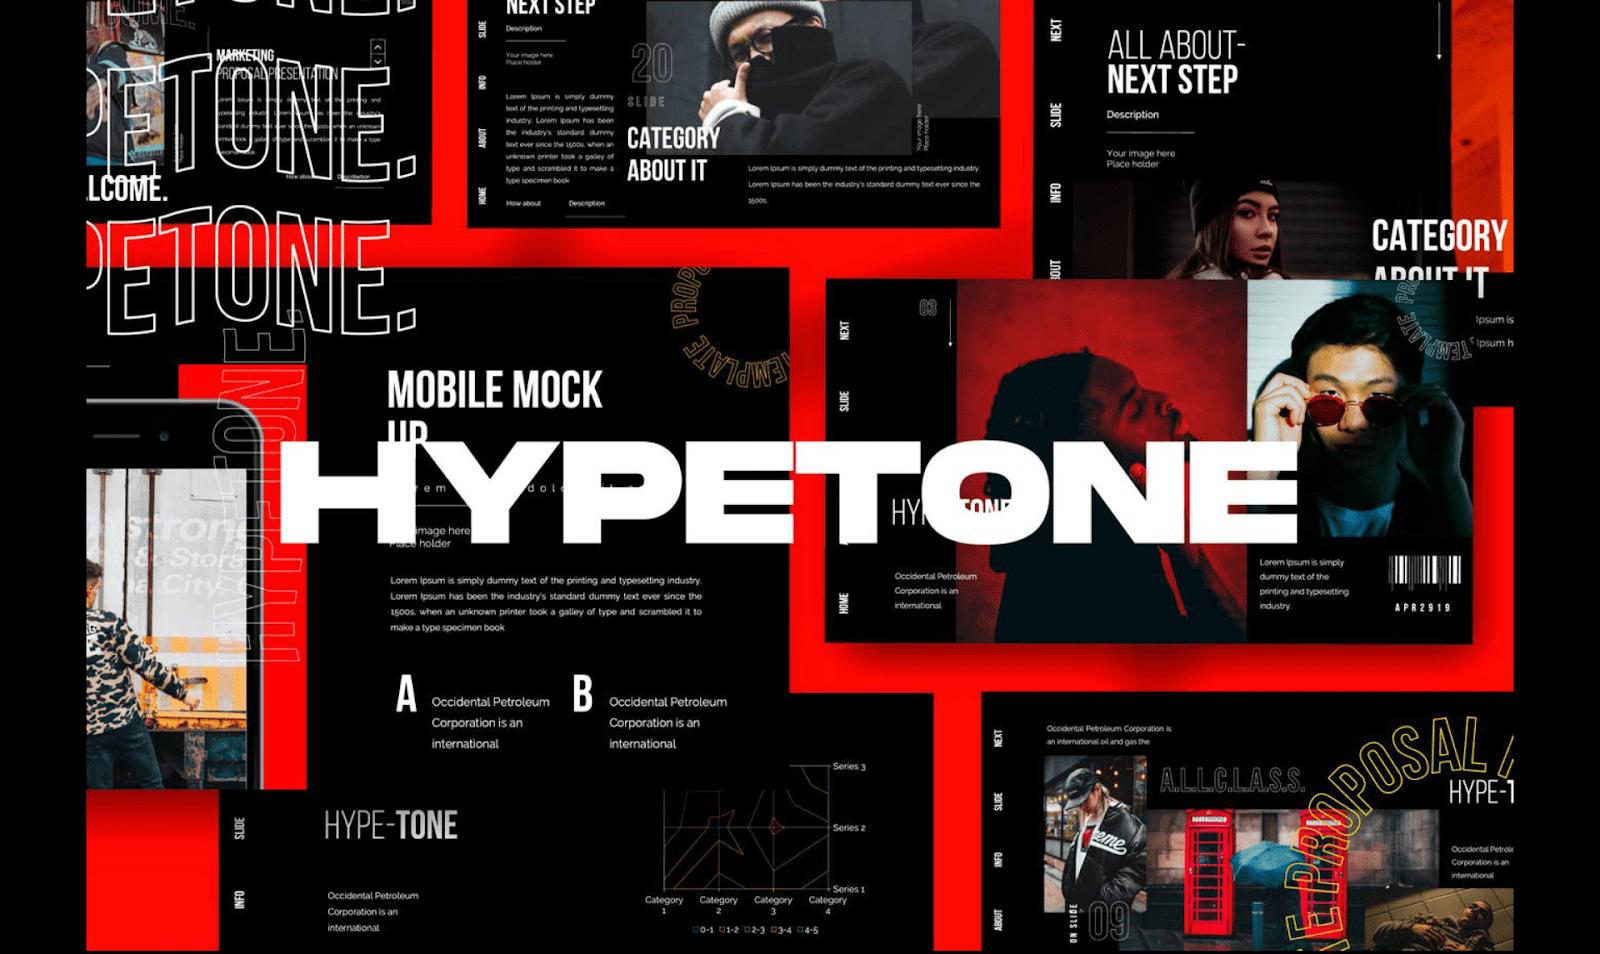 hypetone